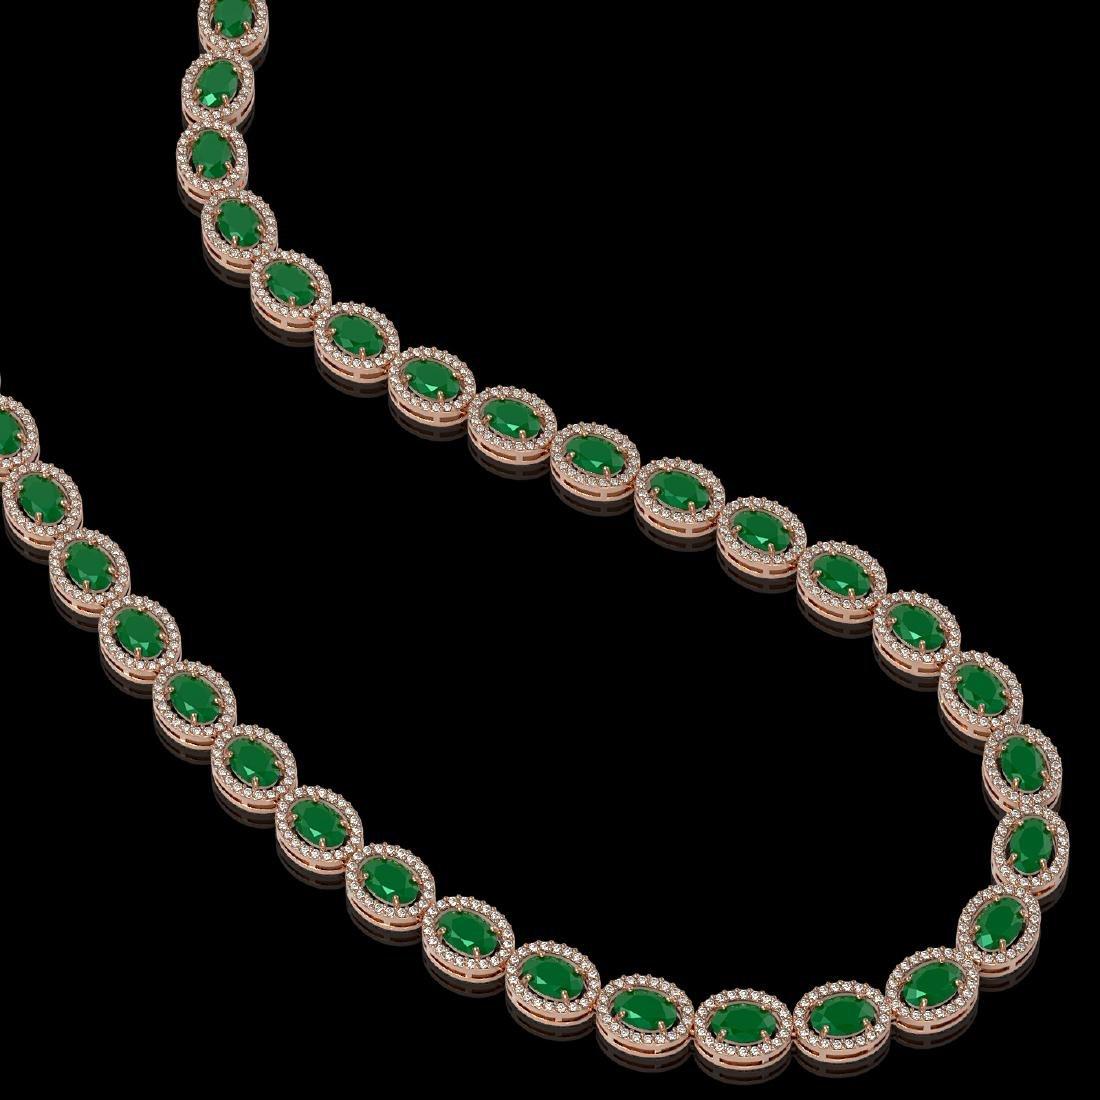 34.11 CTW Emerald & Diamond Halo Necklace 10K Rose Gold - 2